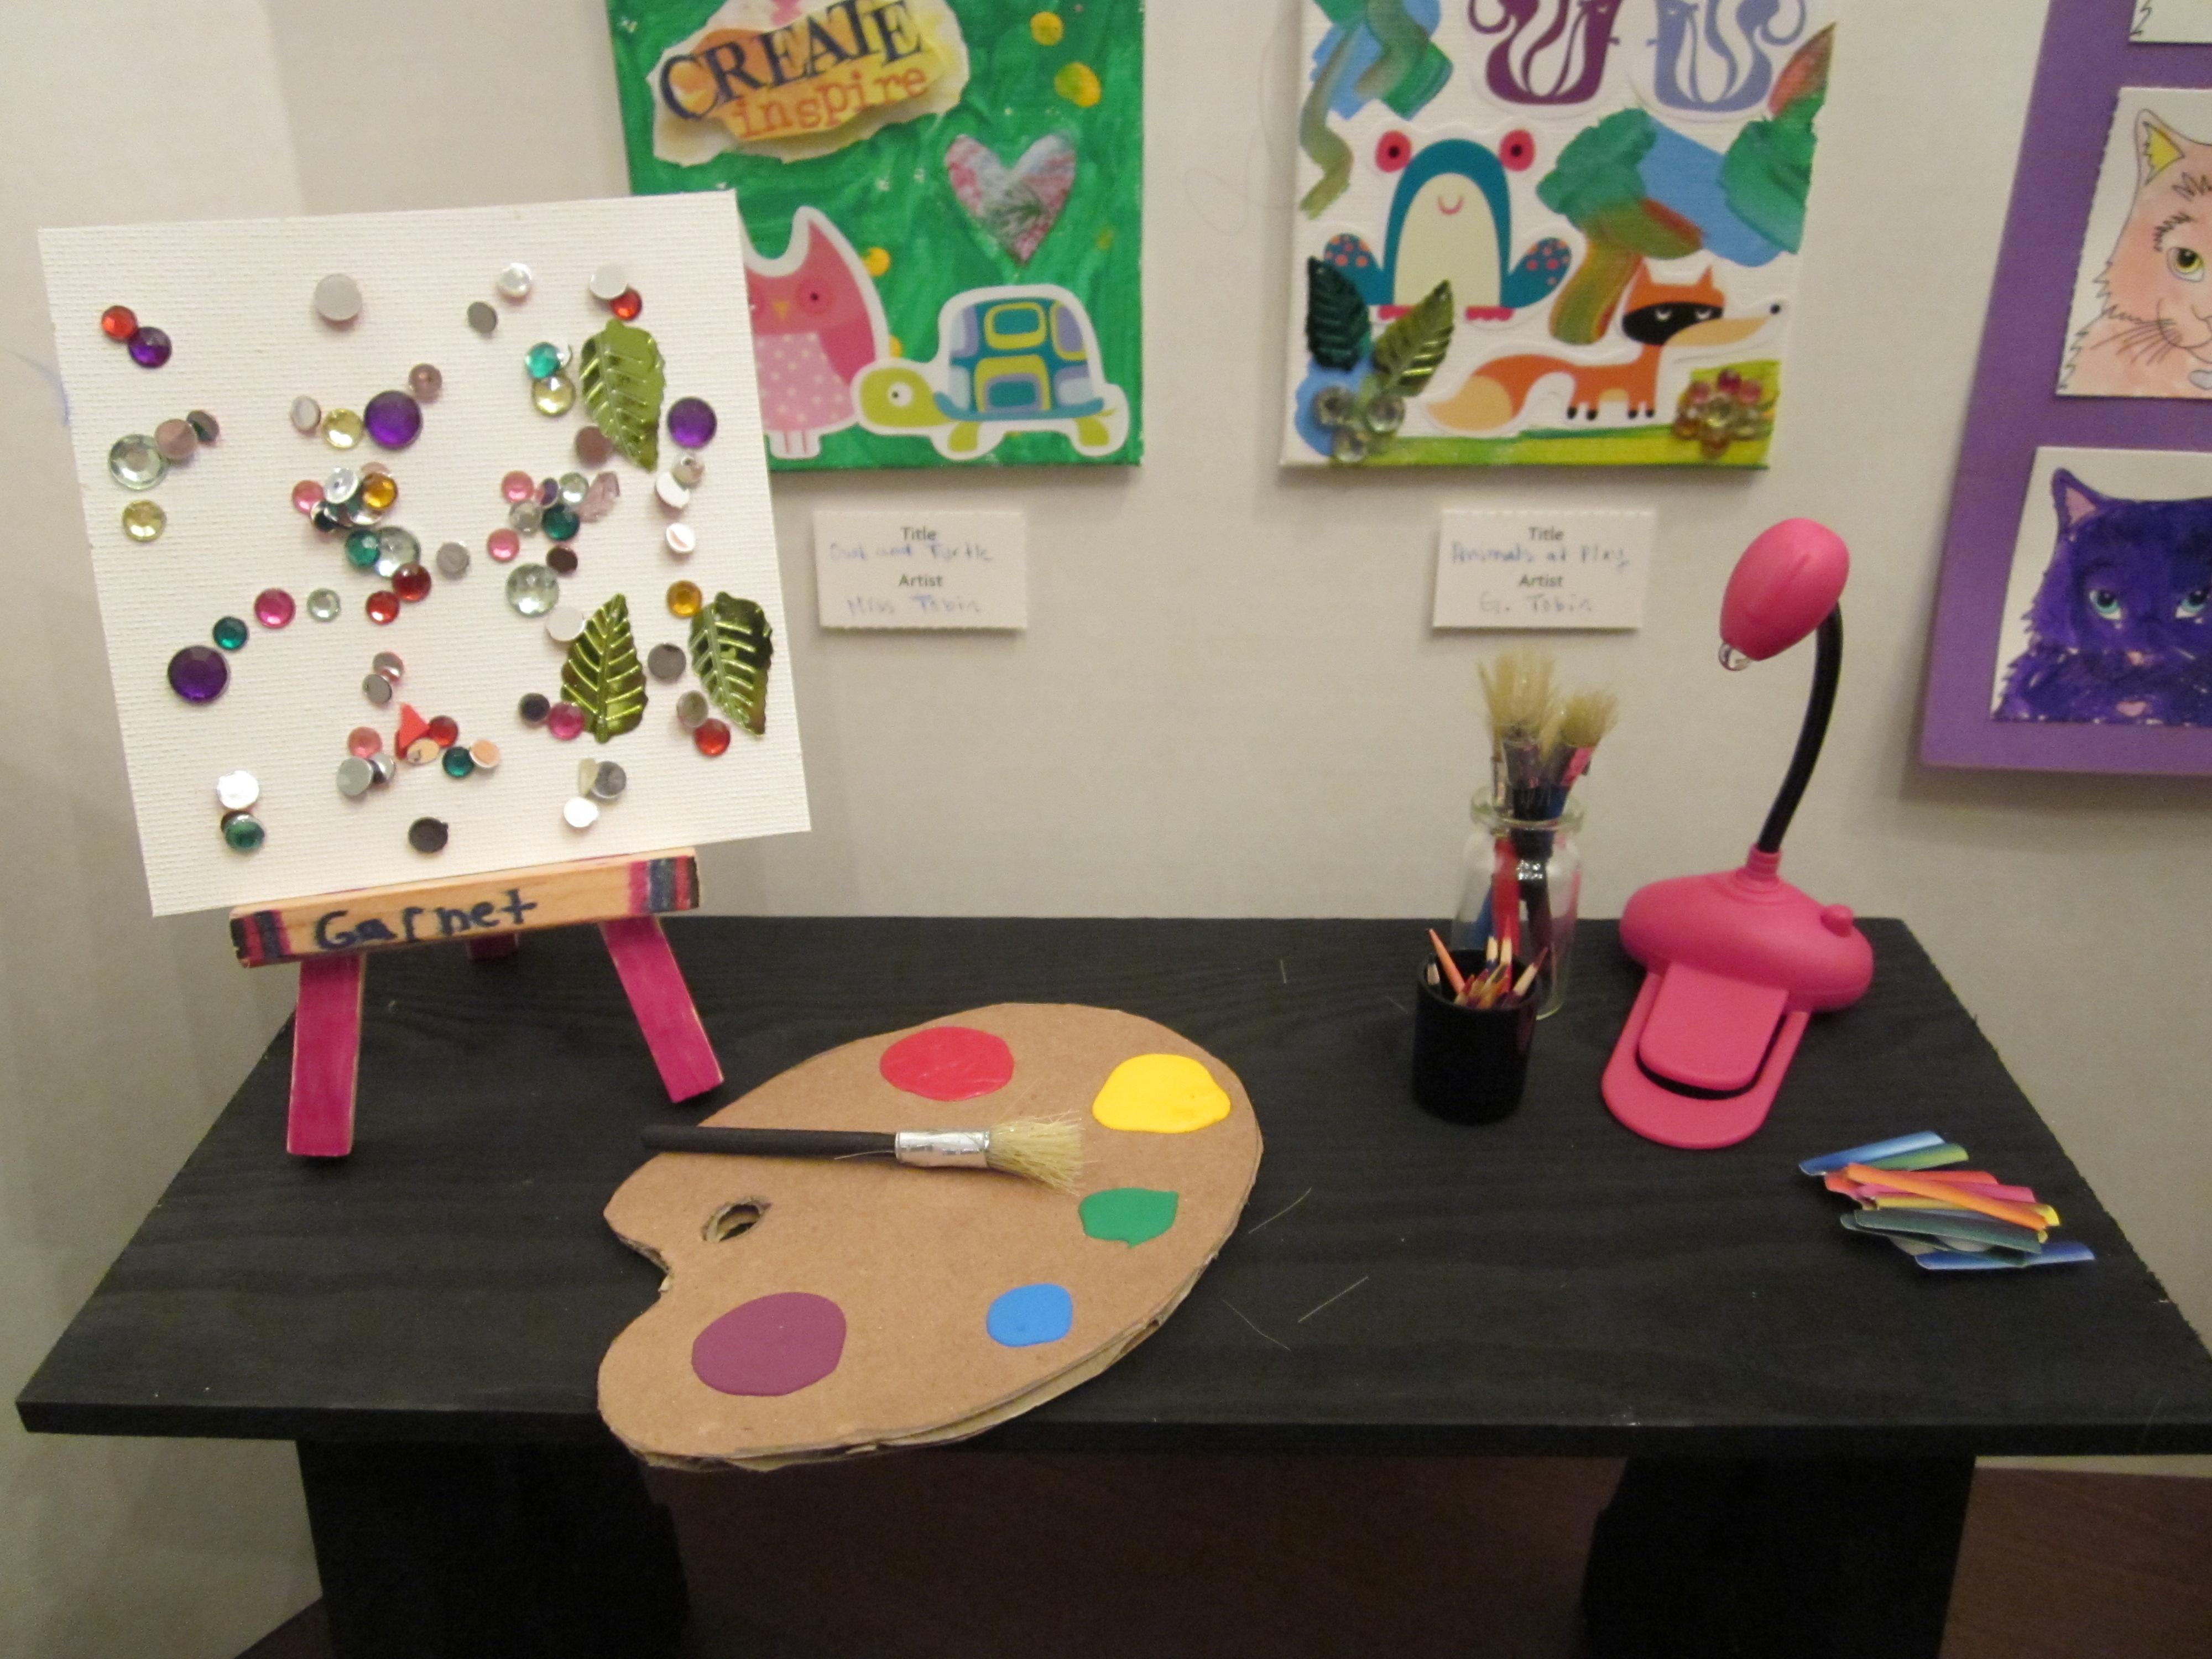 Art Gallery Artist Table